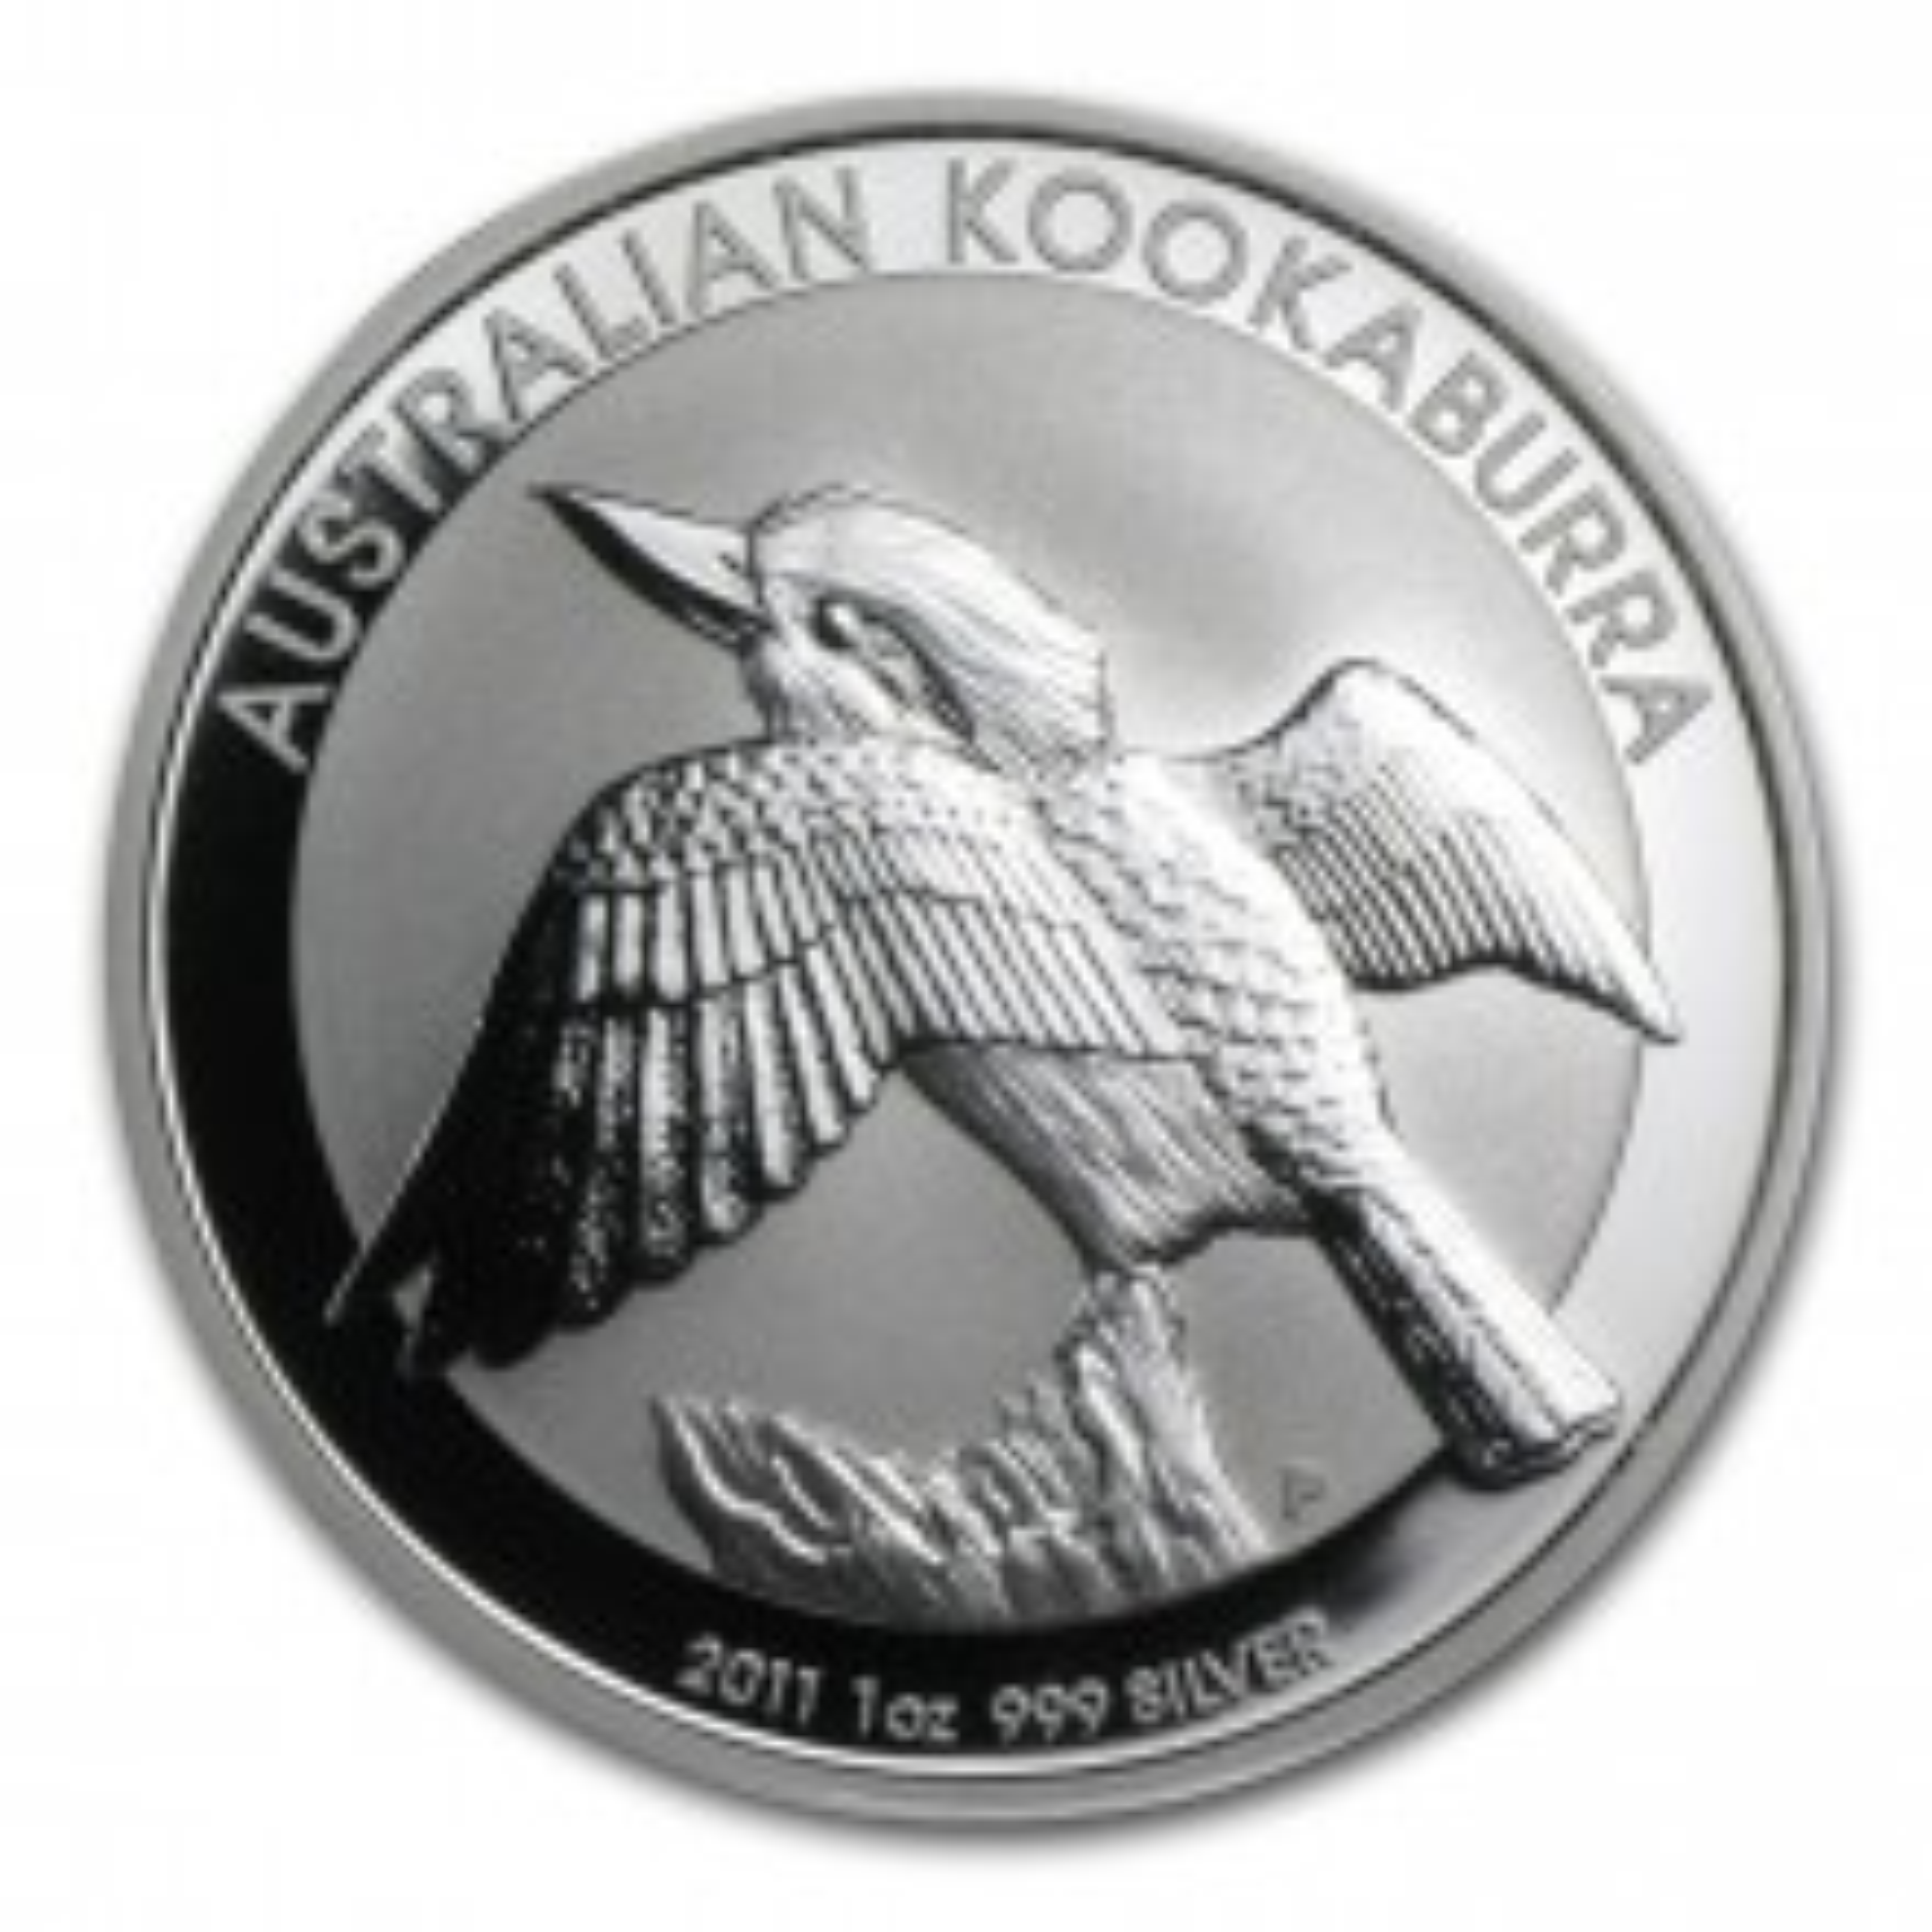 1 troy ounce zilver munt Kookaburra 2011